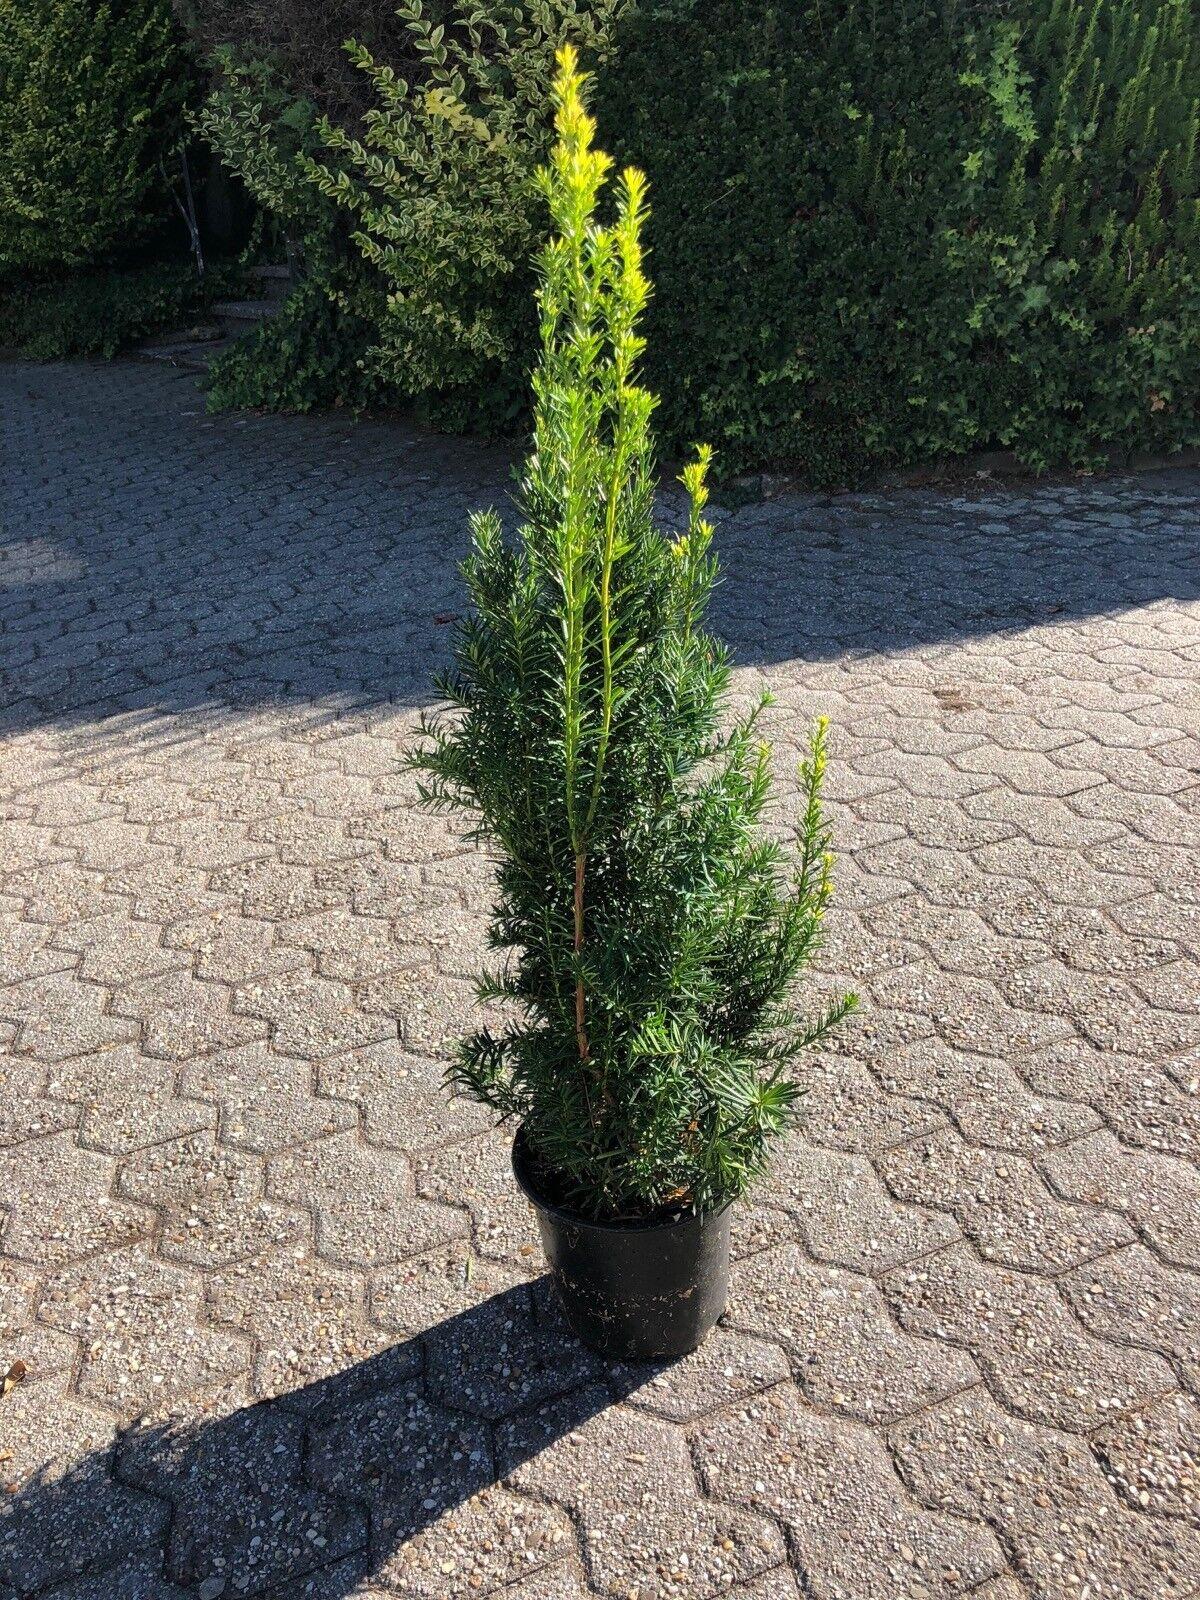 5 x Taxus media 'Hicksii' 60-80 cm 3 Ltr Topf (Kegeleibe) TOP FÜR HECKE